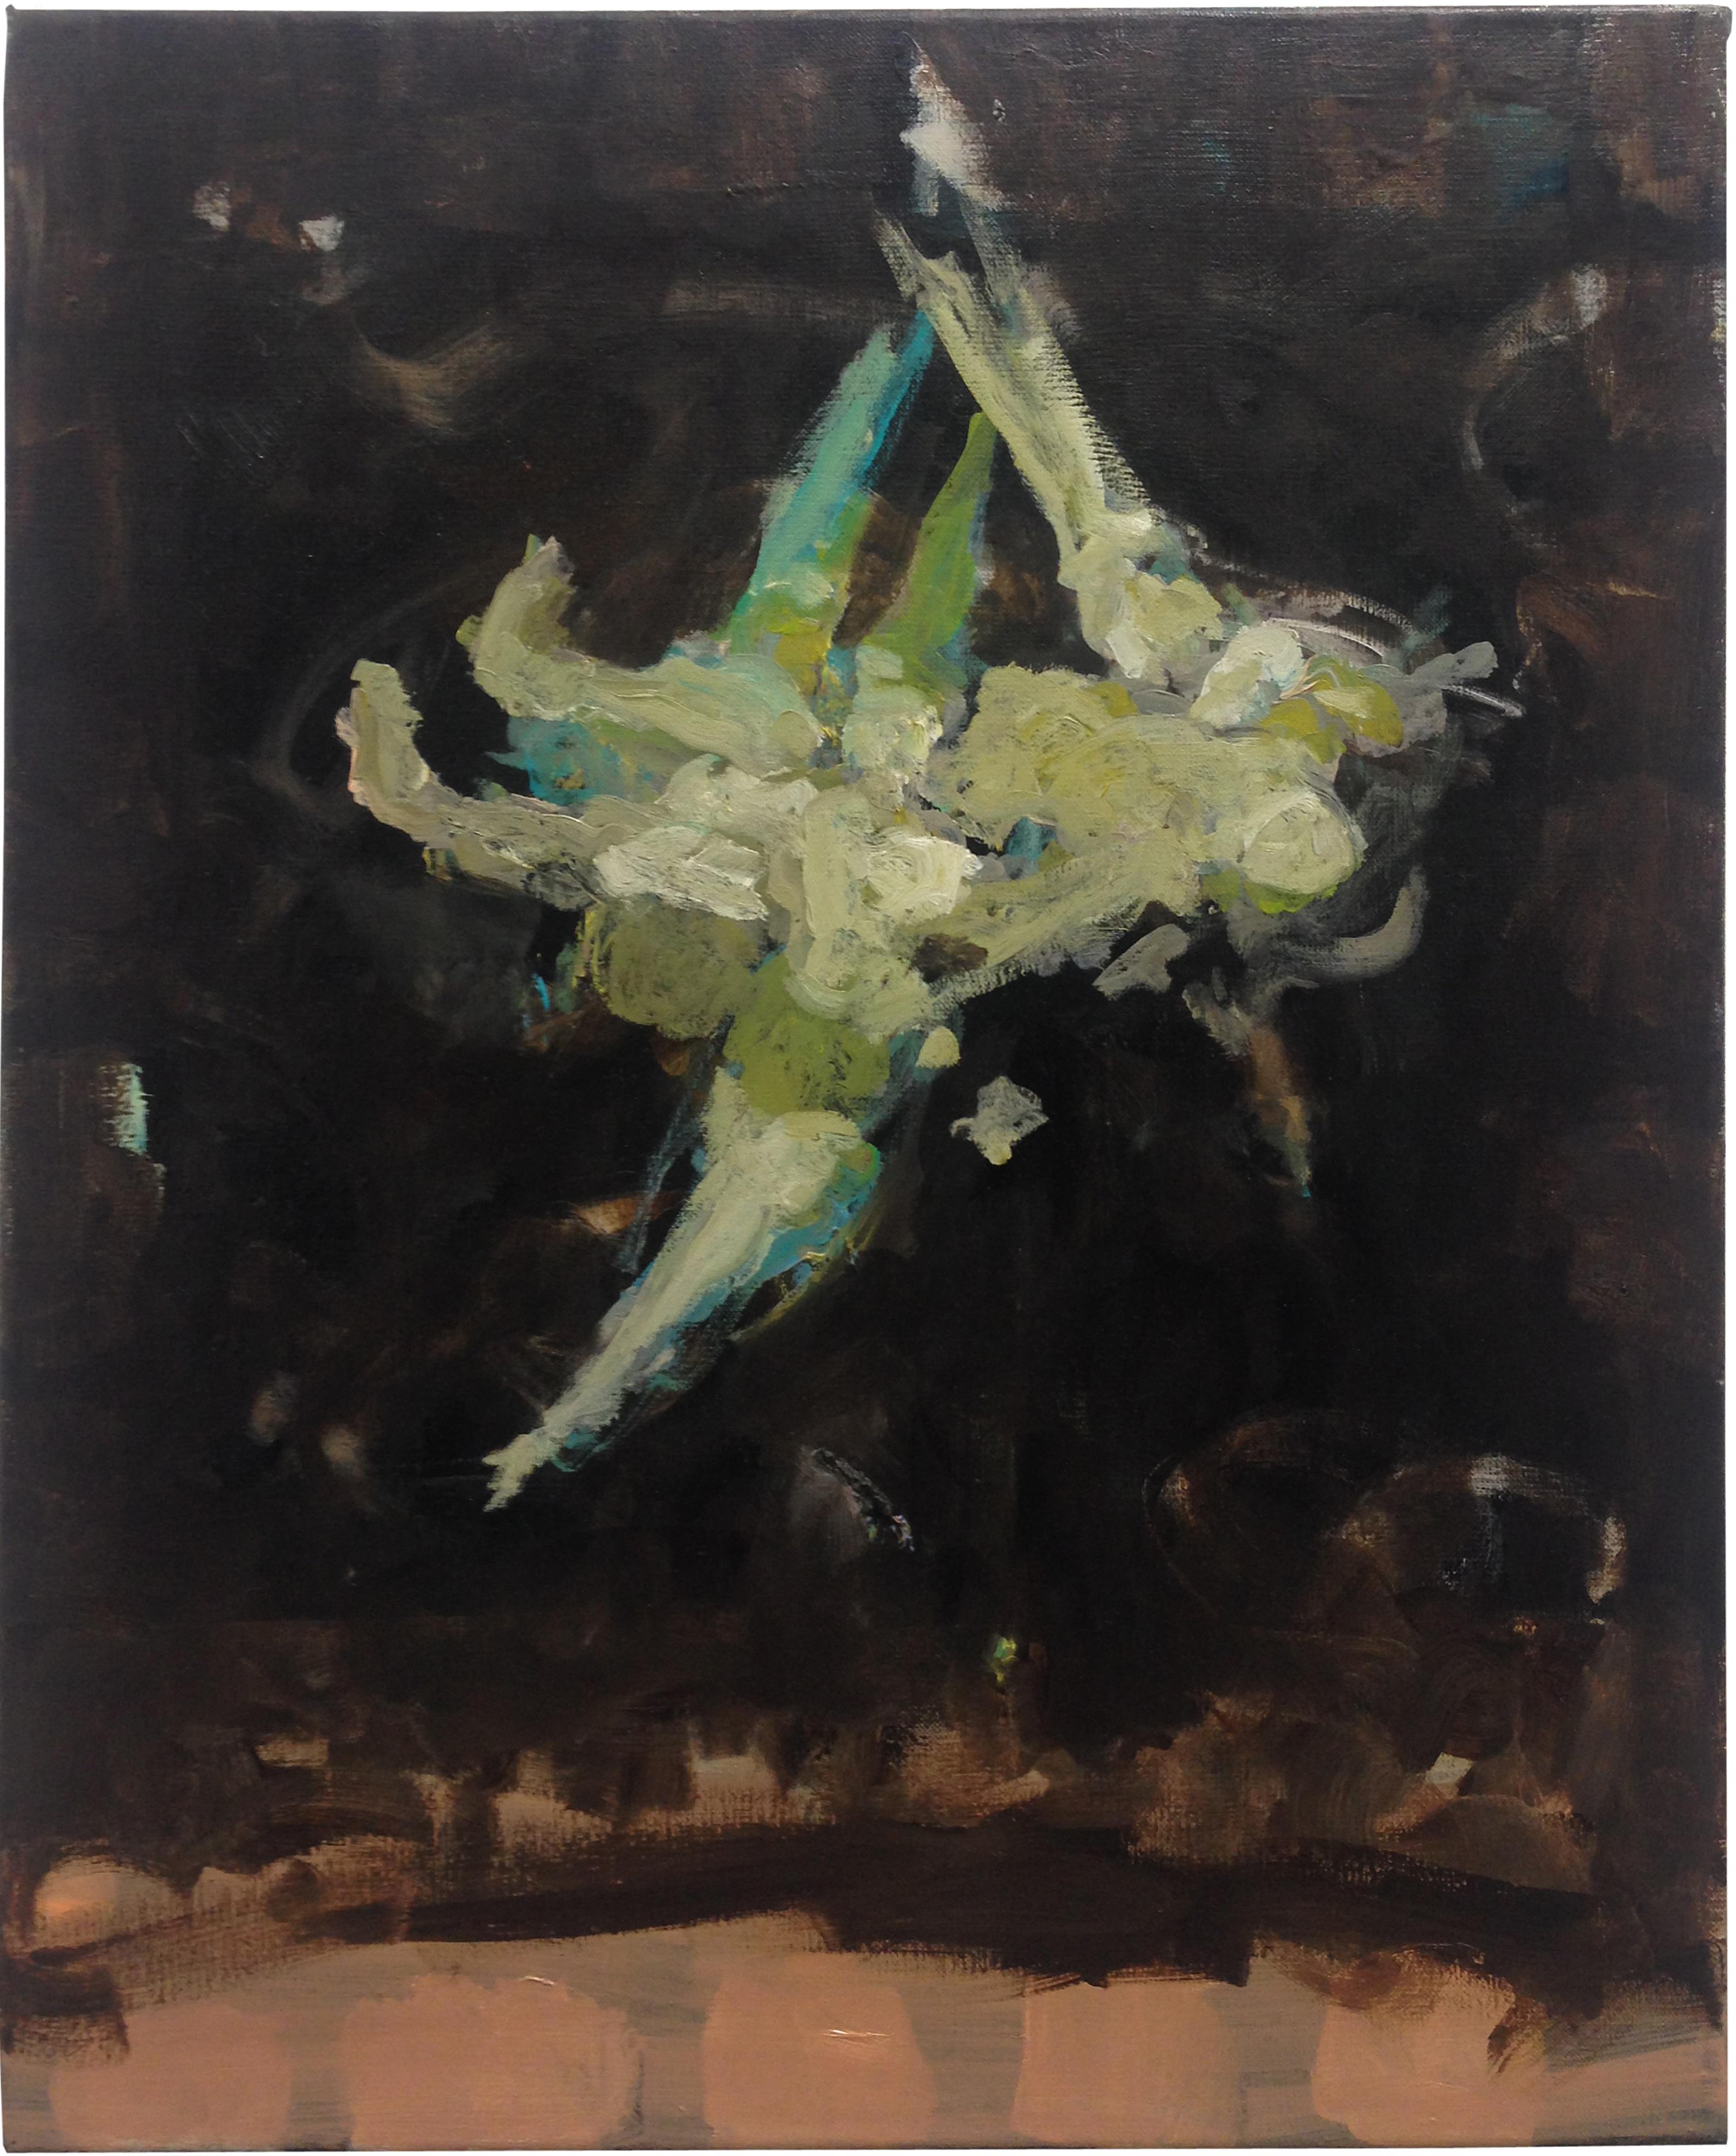 Galerie Barbara Thumm \ Valérie Favre: Ghost (nach Goya 1. esquisse) (VFa-14-021) \ Ghost (nach Goya 1. esquisse) (2014)